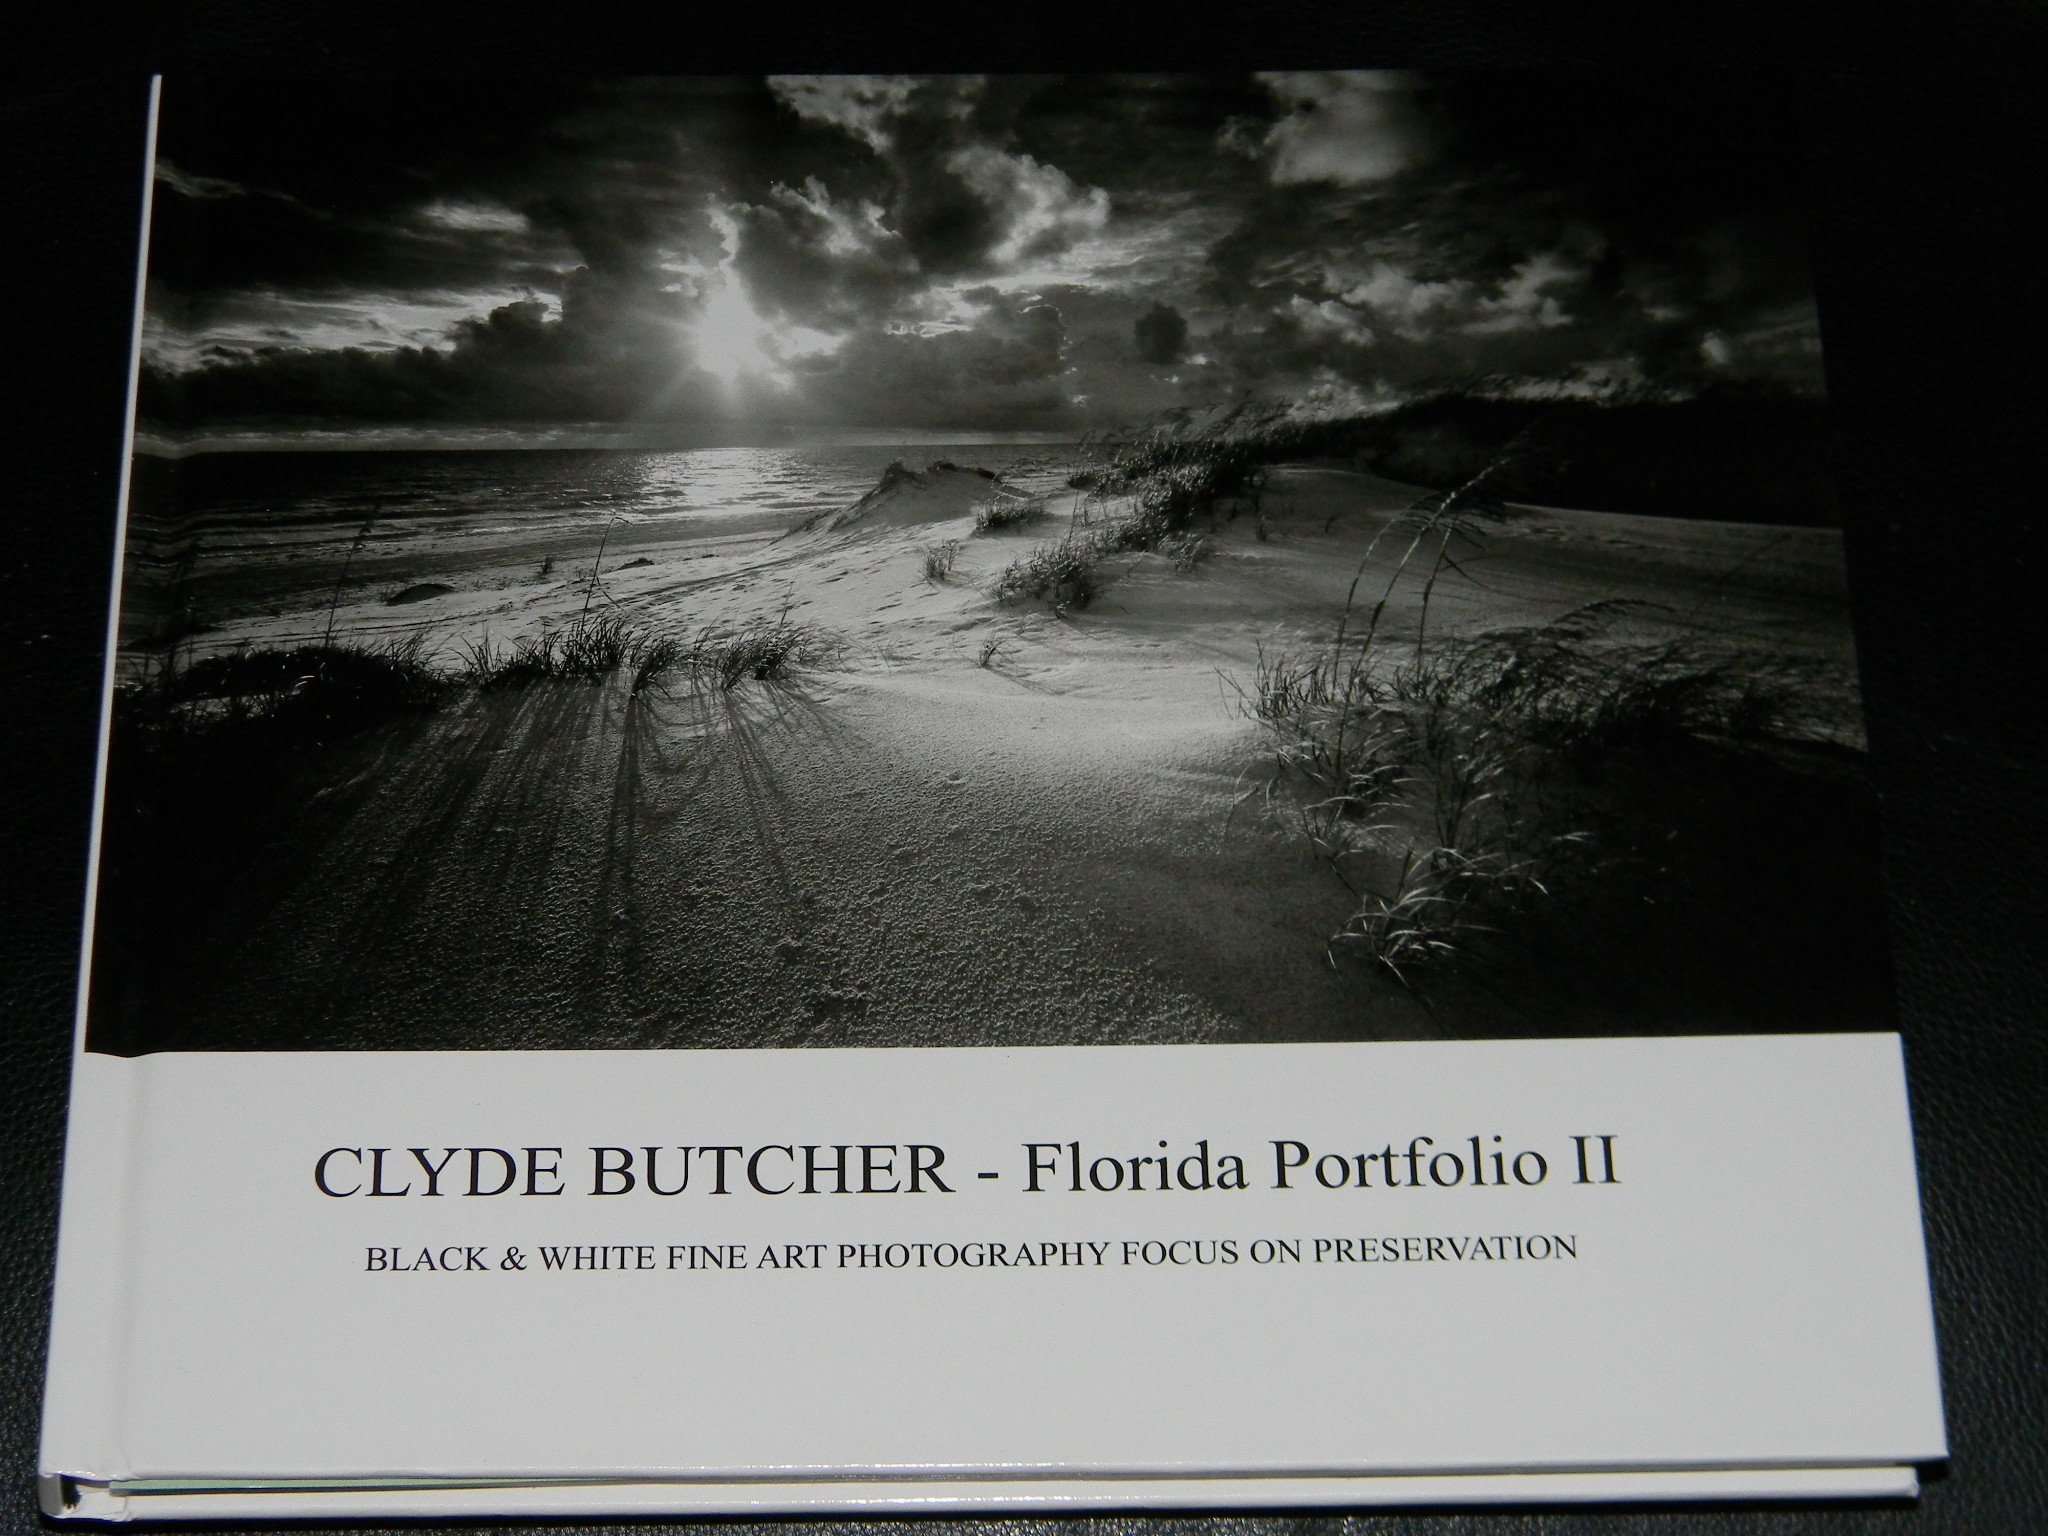 Clyde butcher florida portfolio ii black white fine art